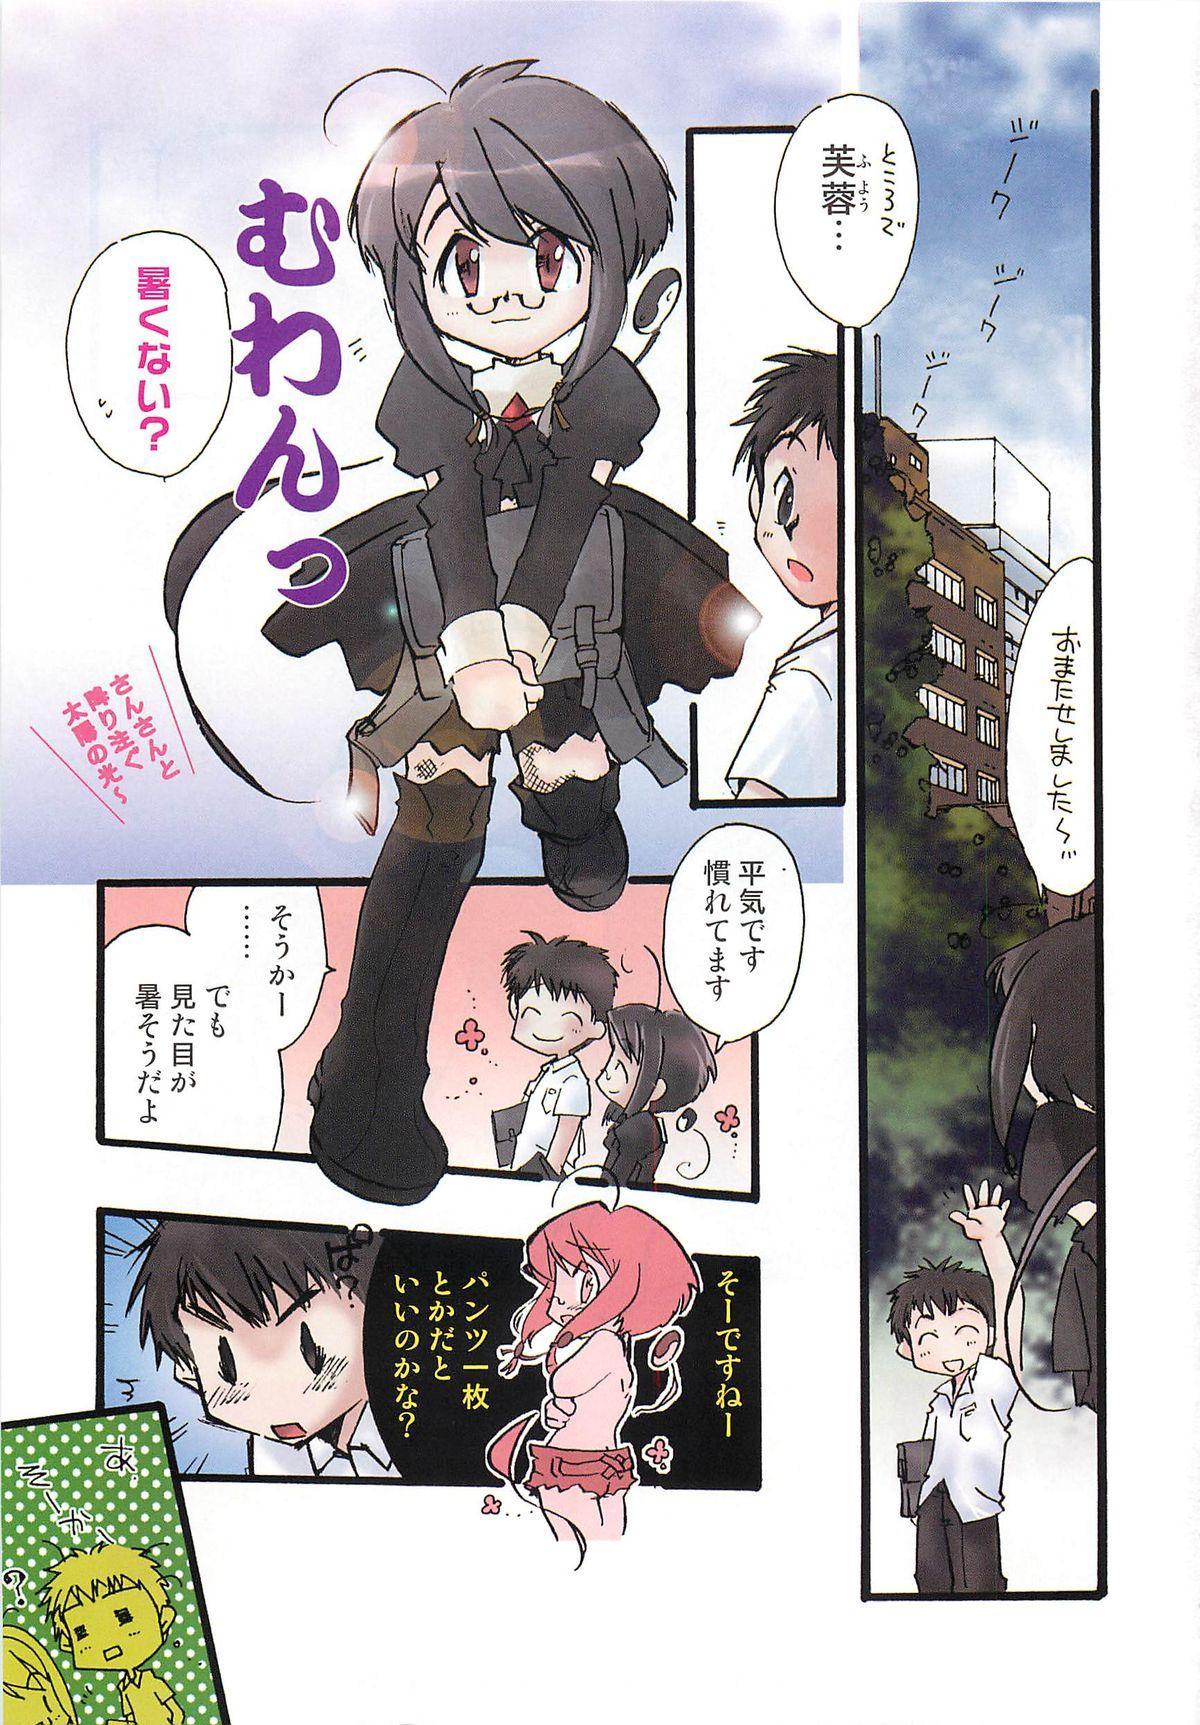 Otokonoko HEAVEN Vol. 02 Dokidoki Chikan Taiken 5